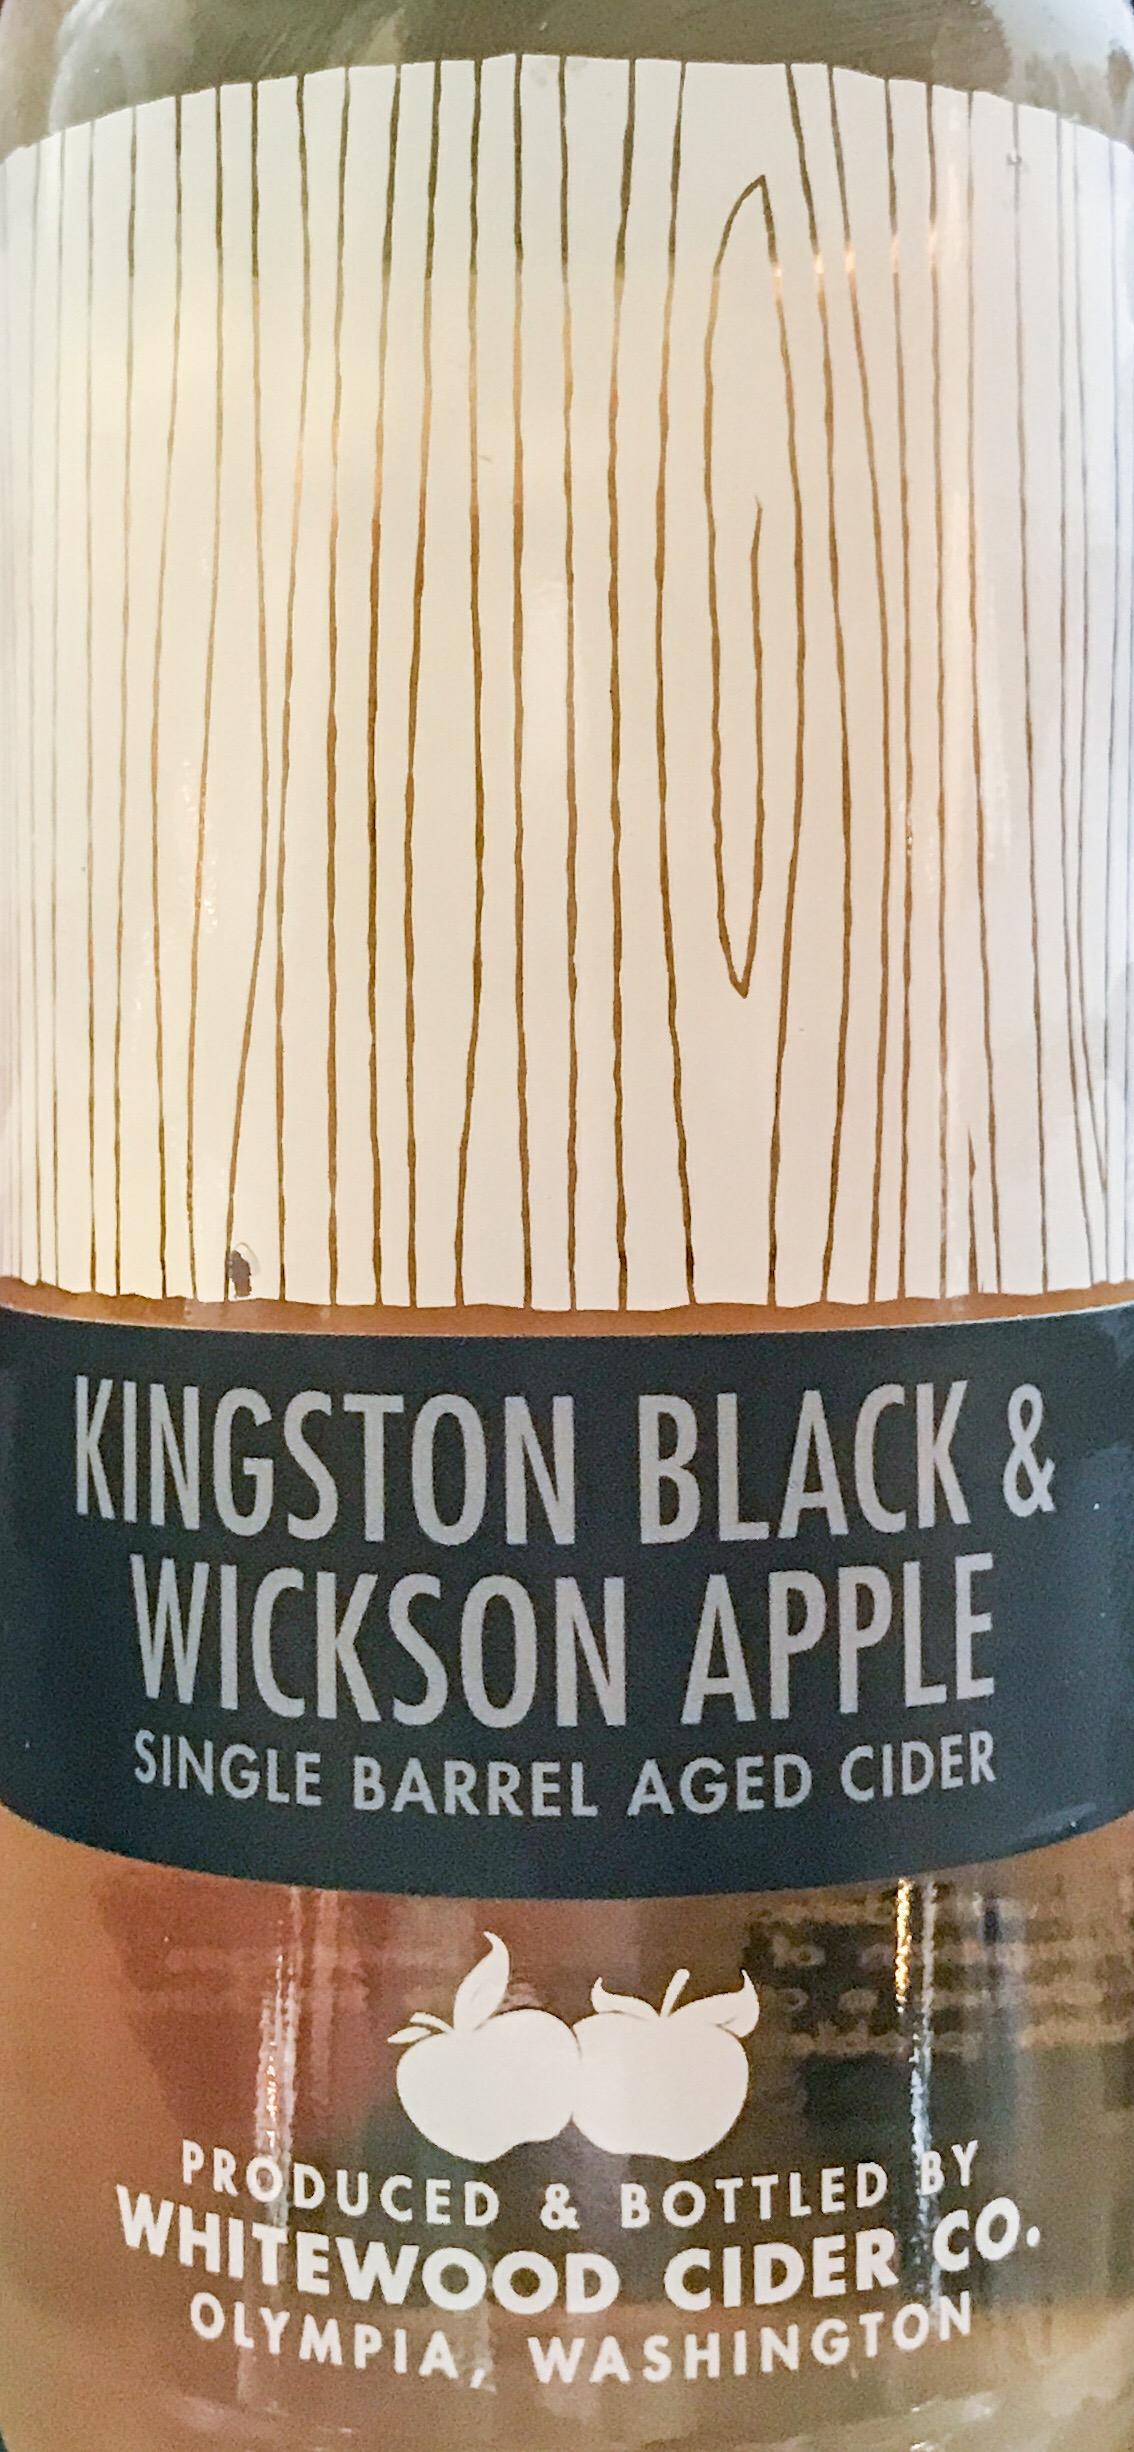 Kingston Black and Wickson Apple